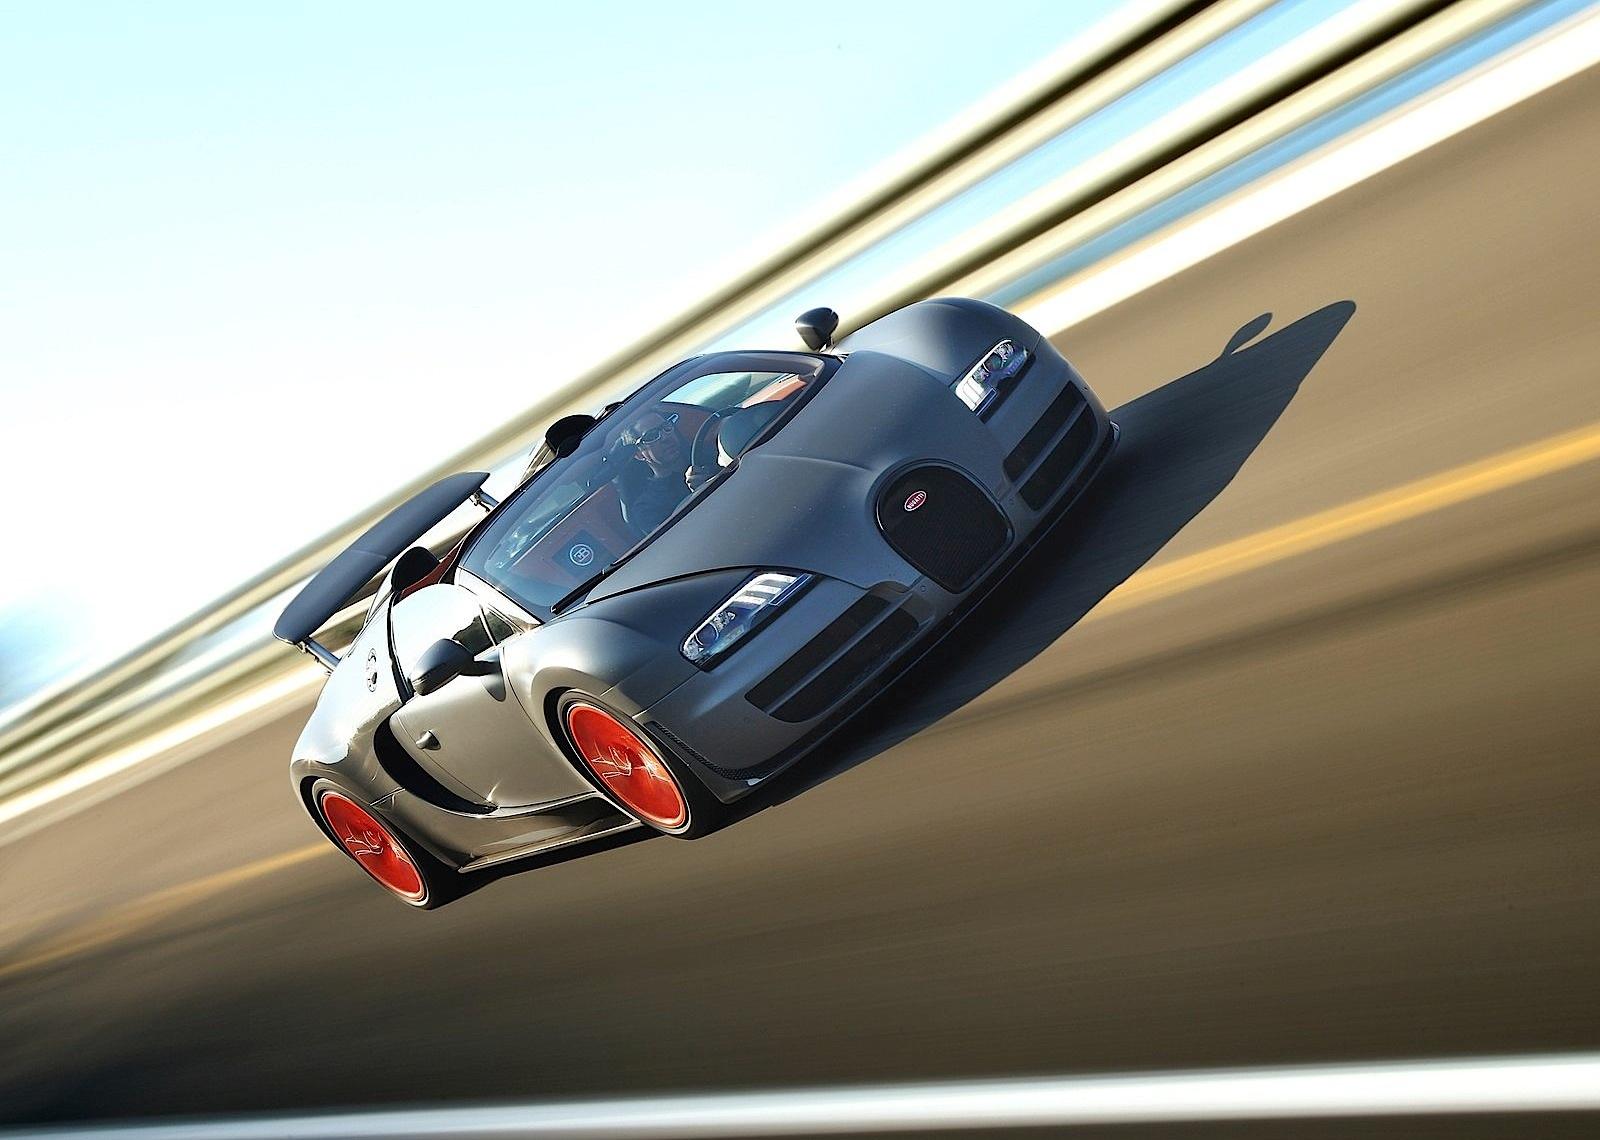 2015 bugatti veyron grand sport vitesse horsepower 2015. Black Bedroom Furniture Sets. Home Design Ideas